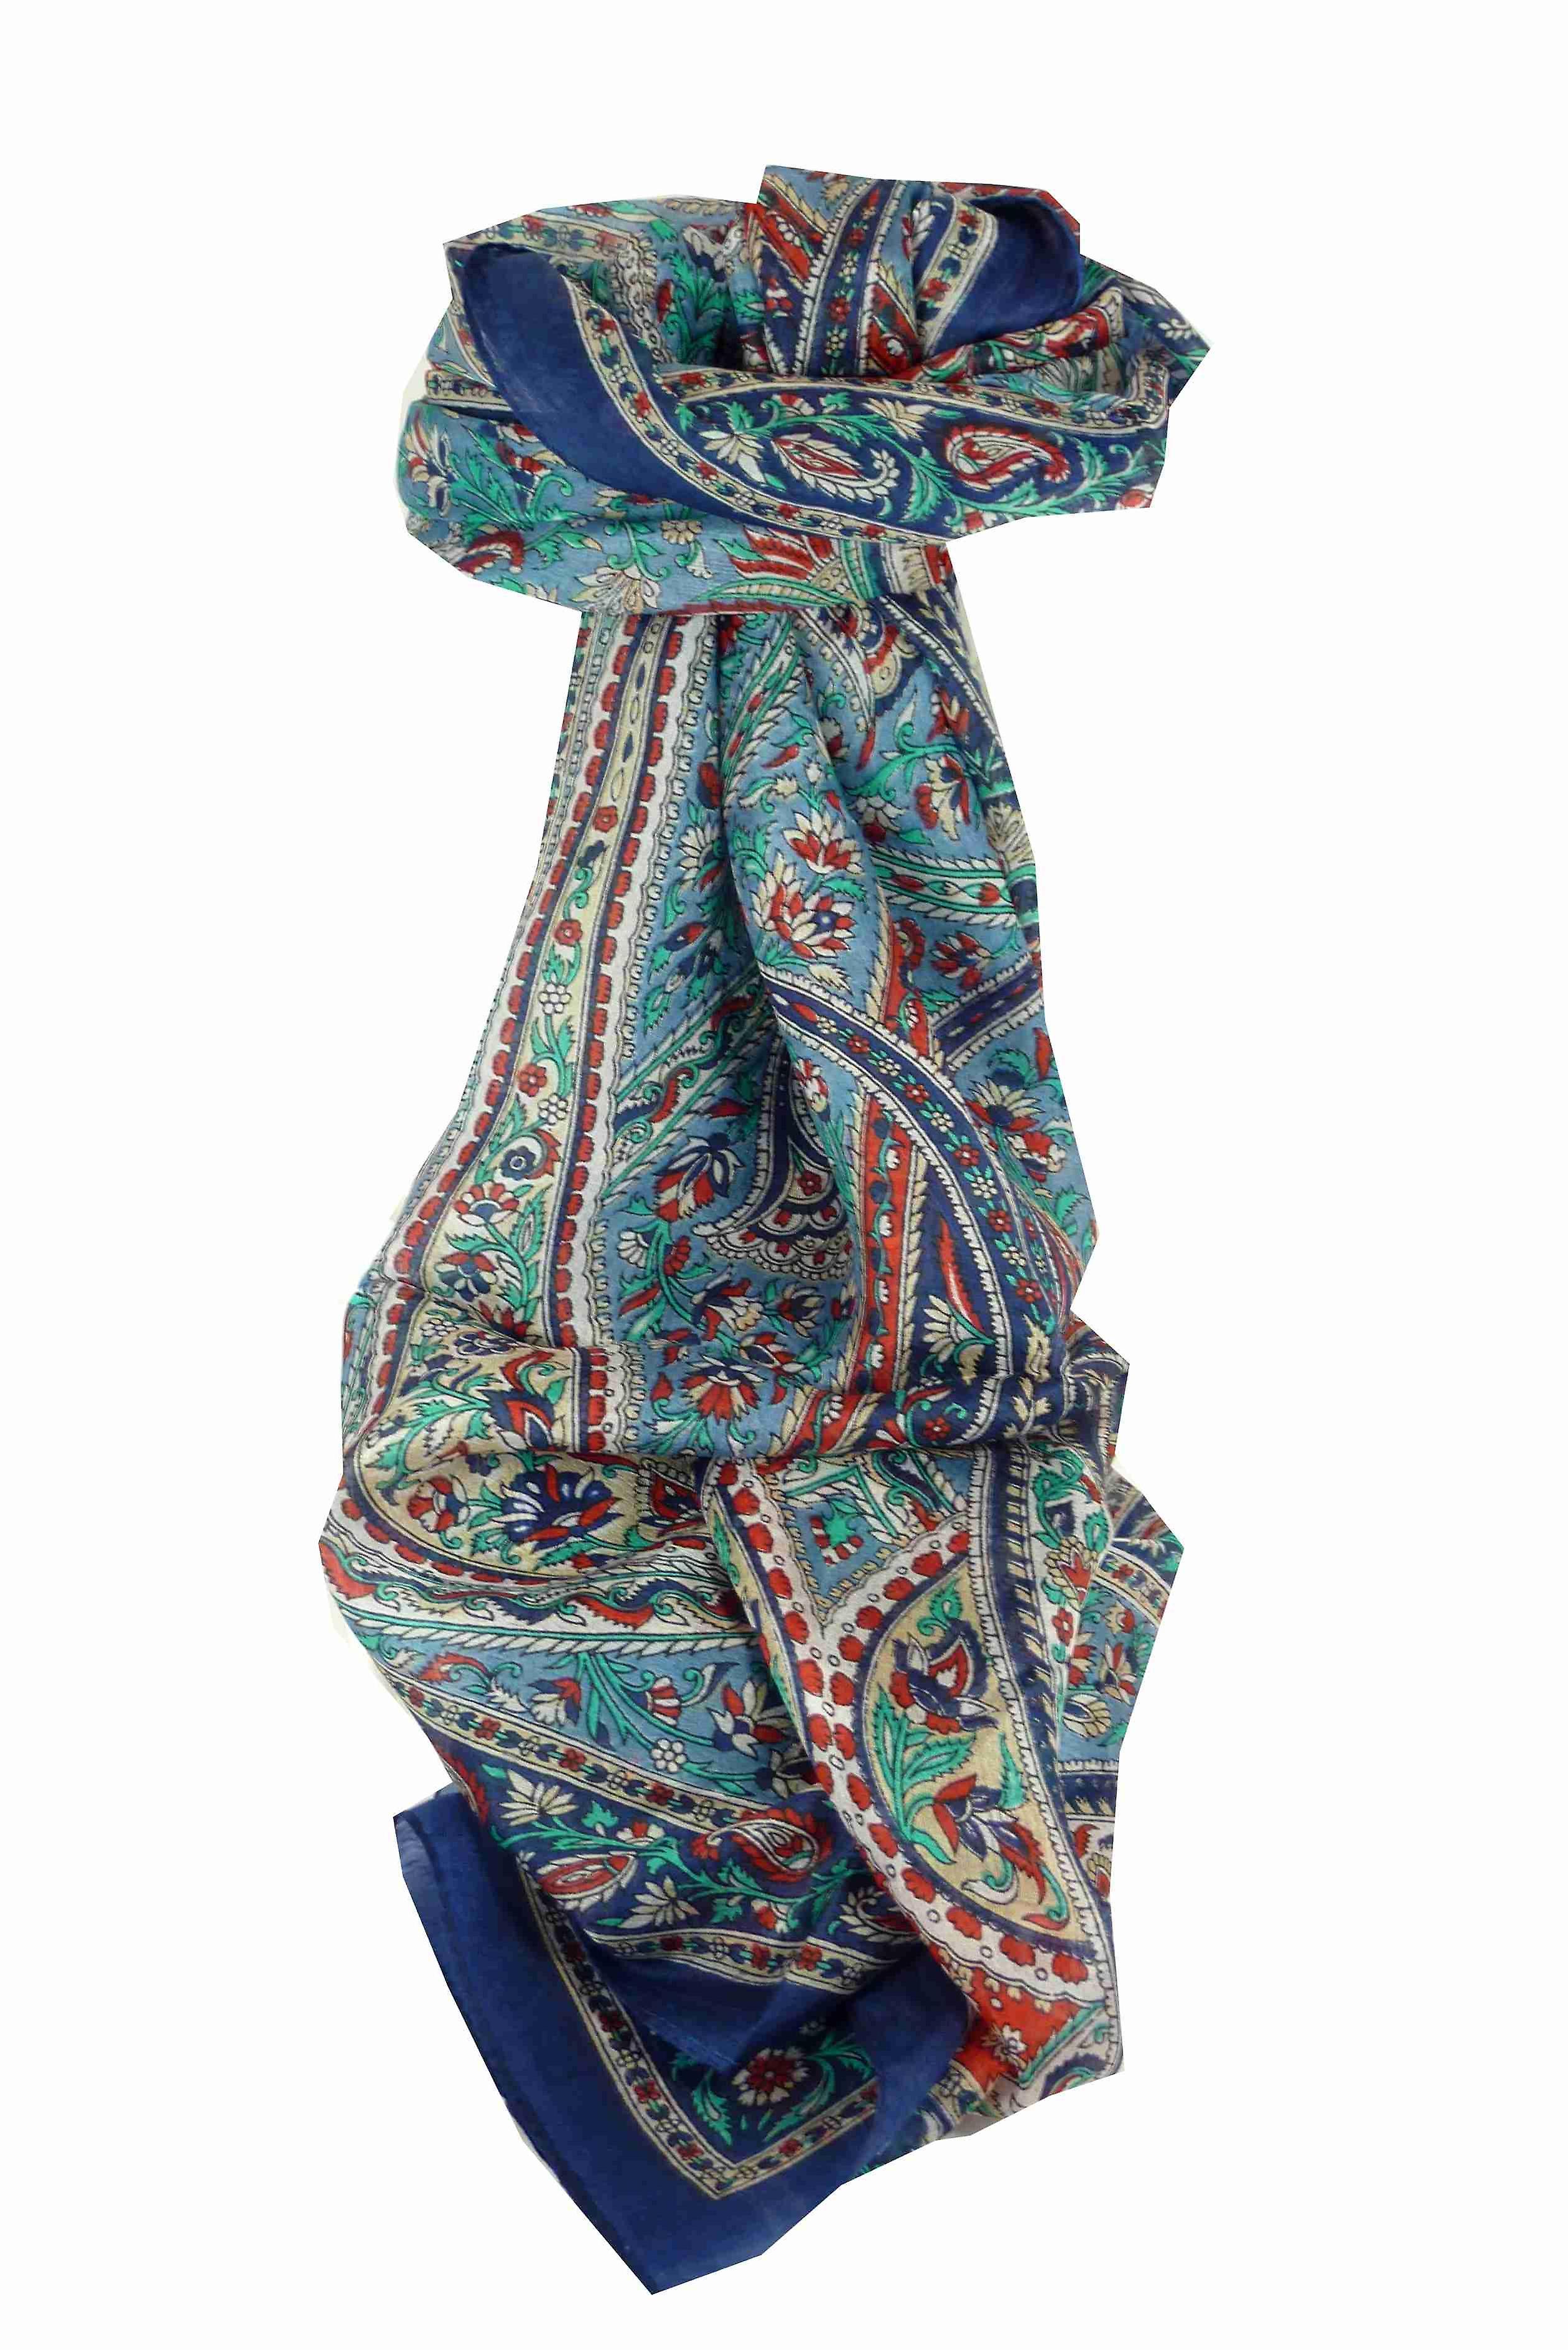 Mulberry Silk Traditional Long Scarf Riya Blue by Pashmina & Silk